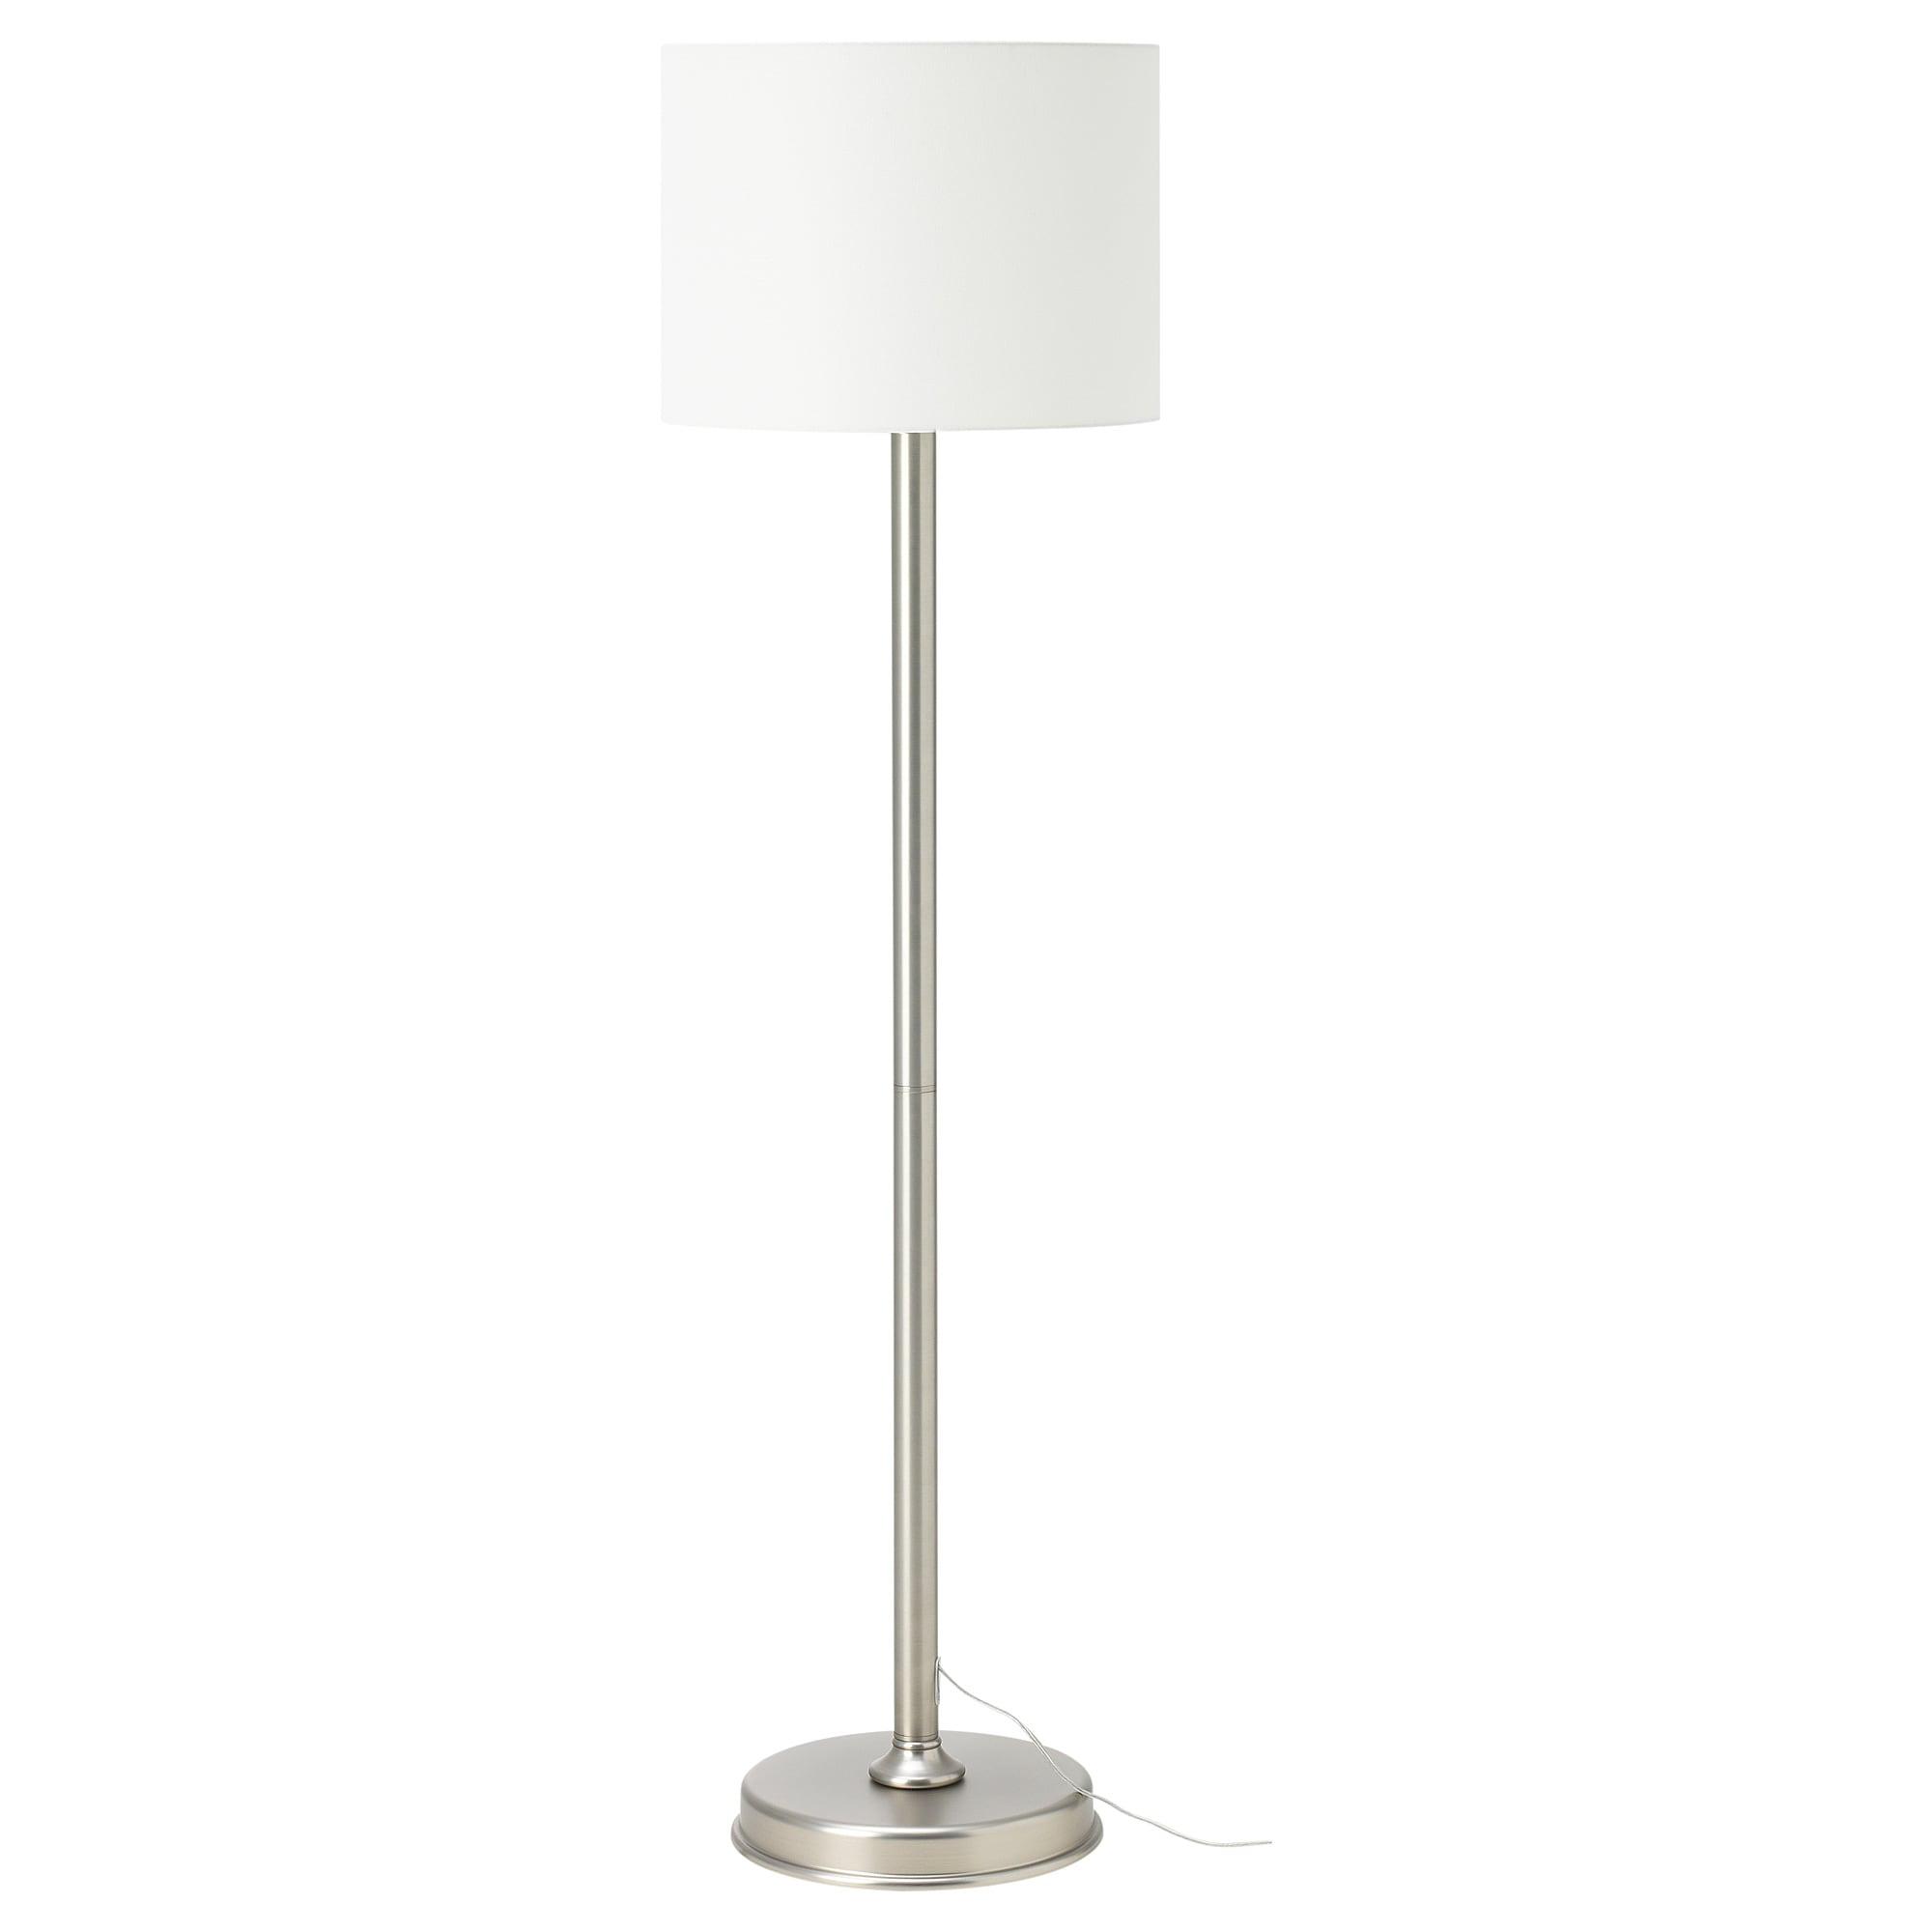 Milleryr Floor Lamp With Led Bulb White Nickel Plated Ikea White Floor Lamp Floor Lamp Tall Lamps Bedroom